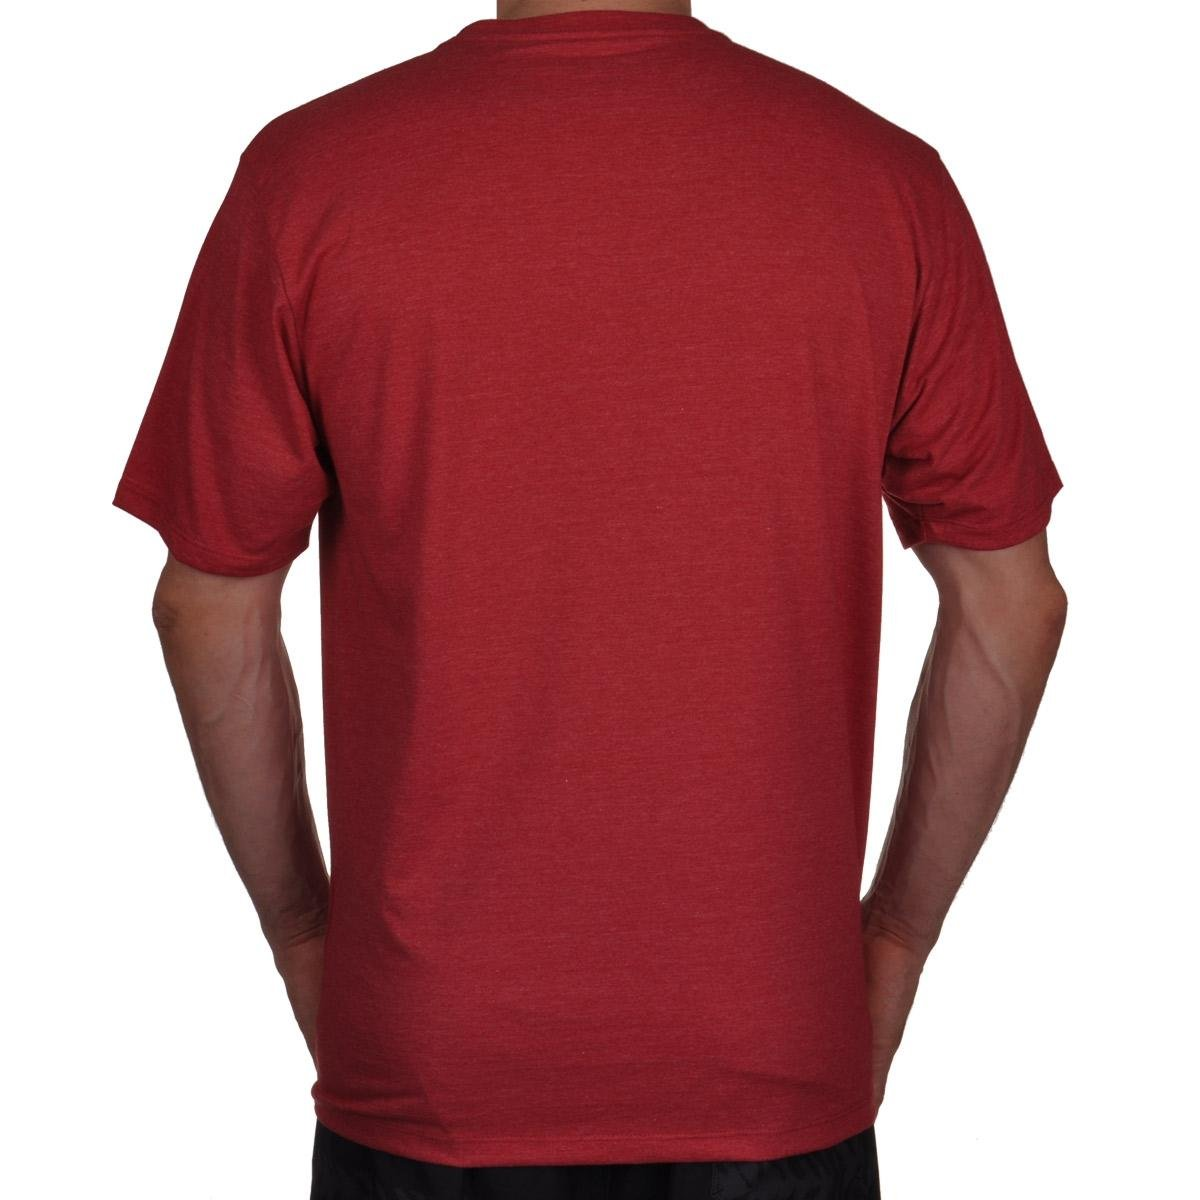 O Camiseta Vermelho Masculino O Hurley Silk Hurley Silk amp;O Camiseta 4fn1UwqPxq